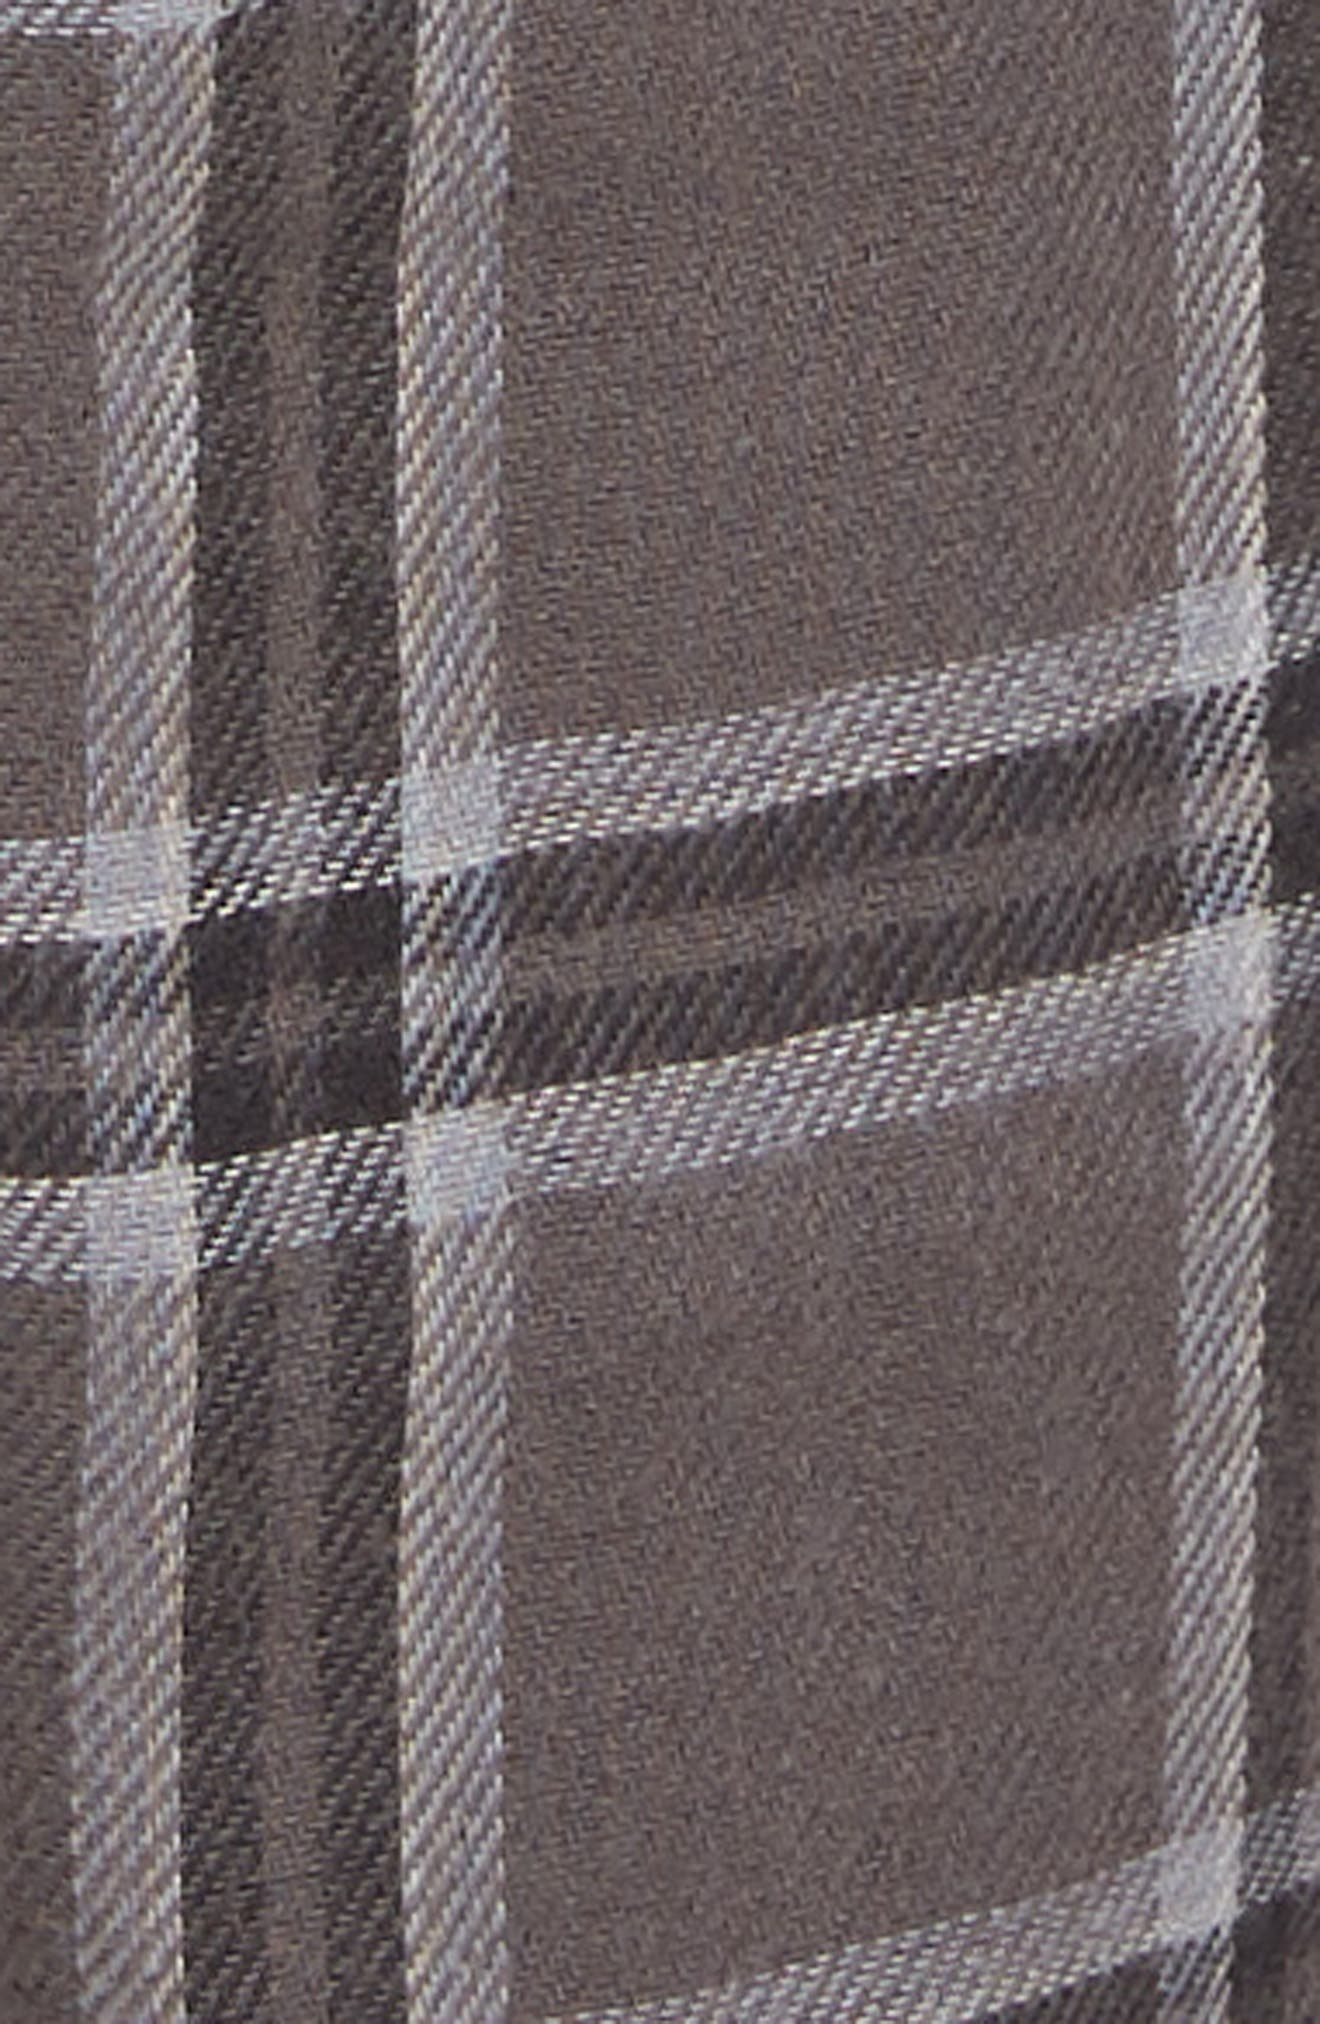 Grant Pajama Set,                             Alternate thumbnail 5, color,                             CHARCOAL/ BLACK